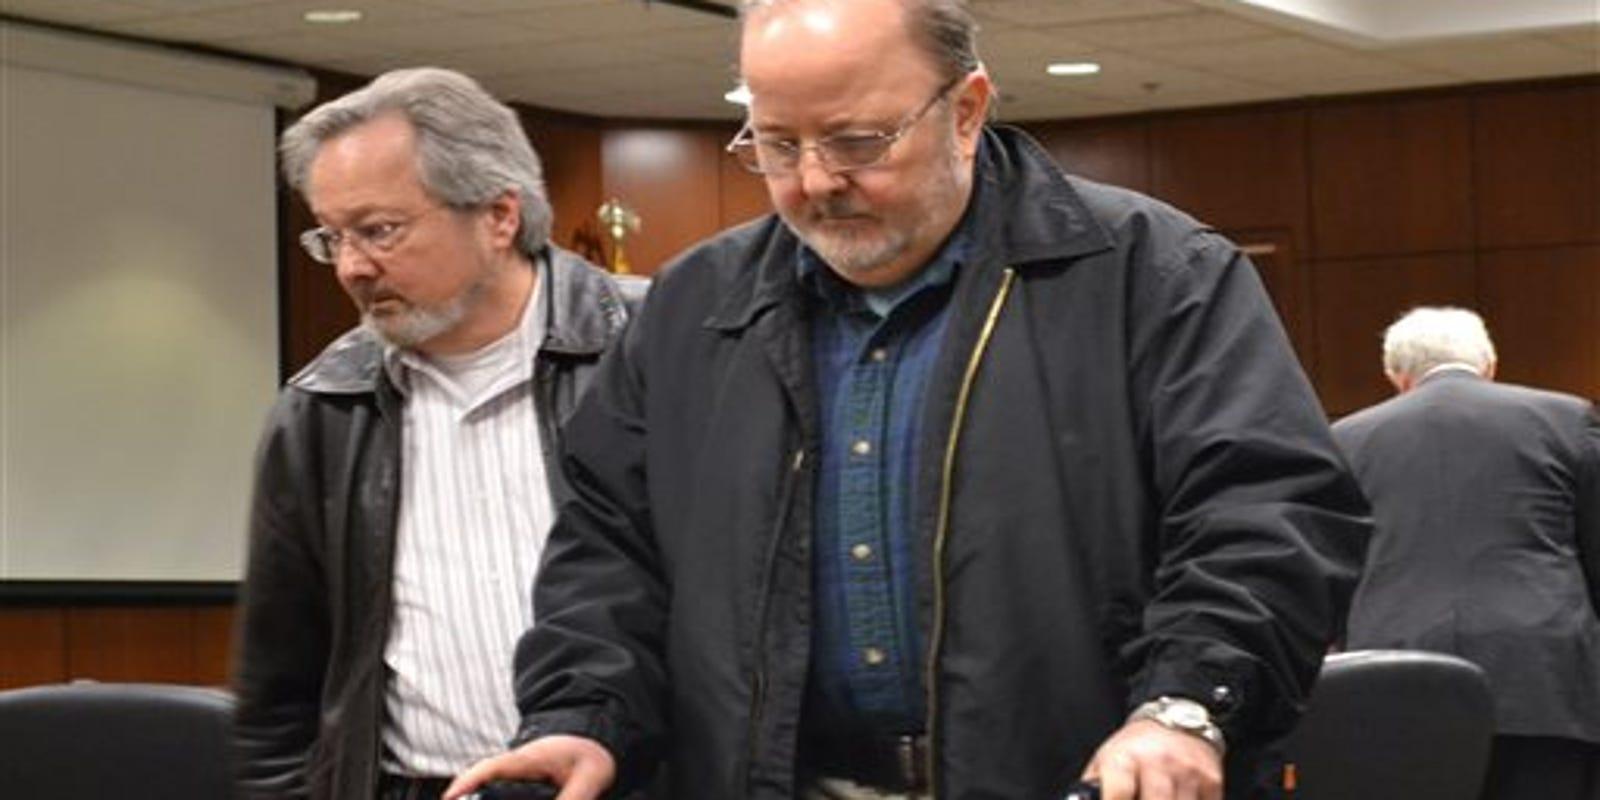 Ex-priest Schook convicted in sodomy case